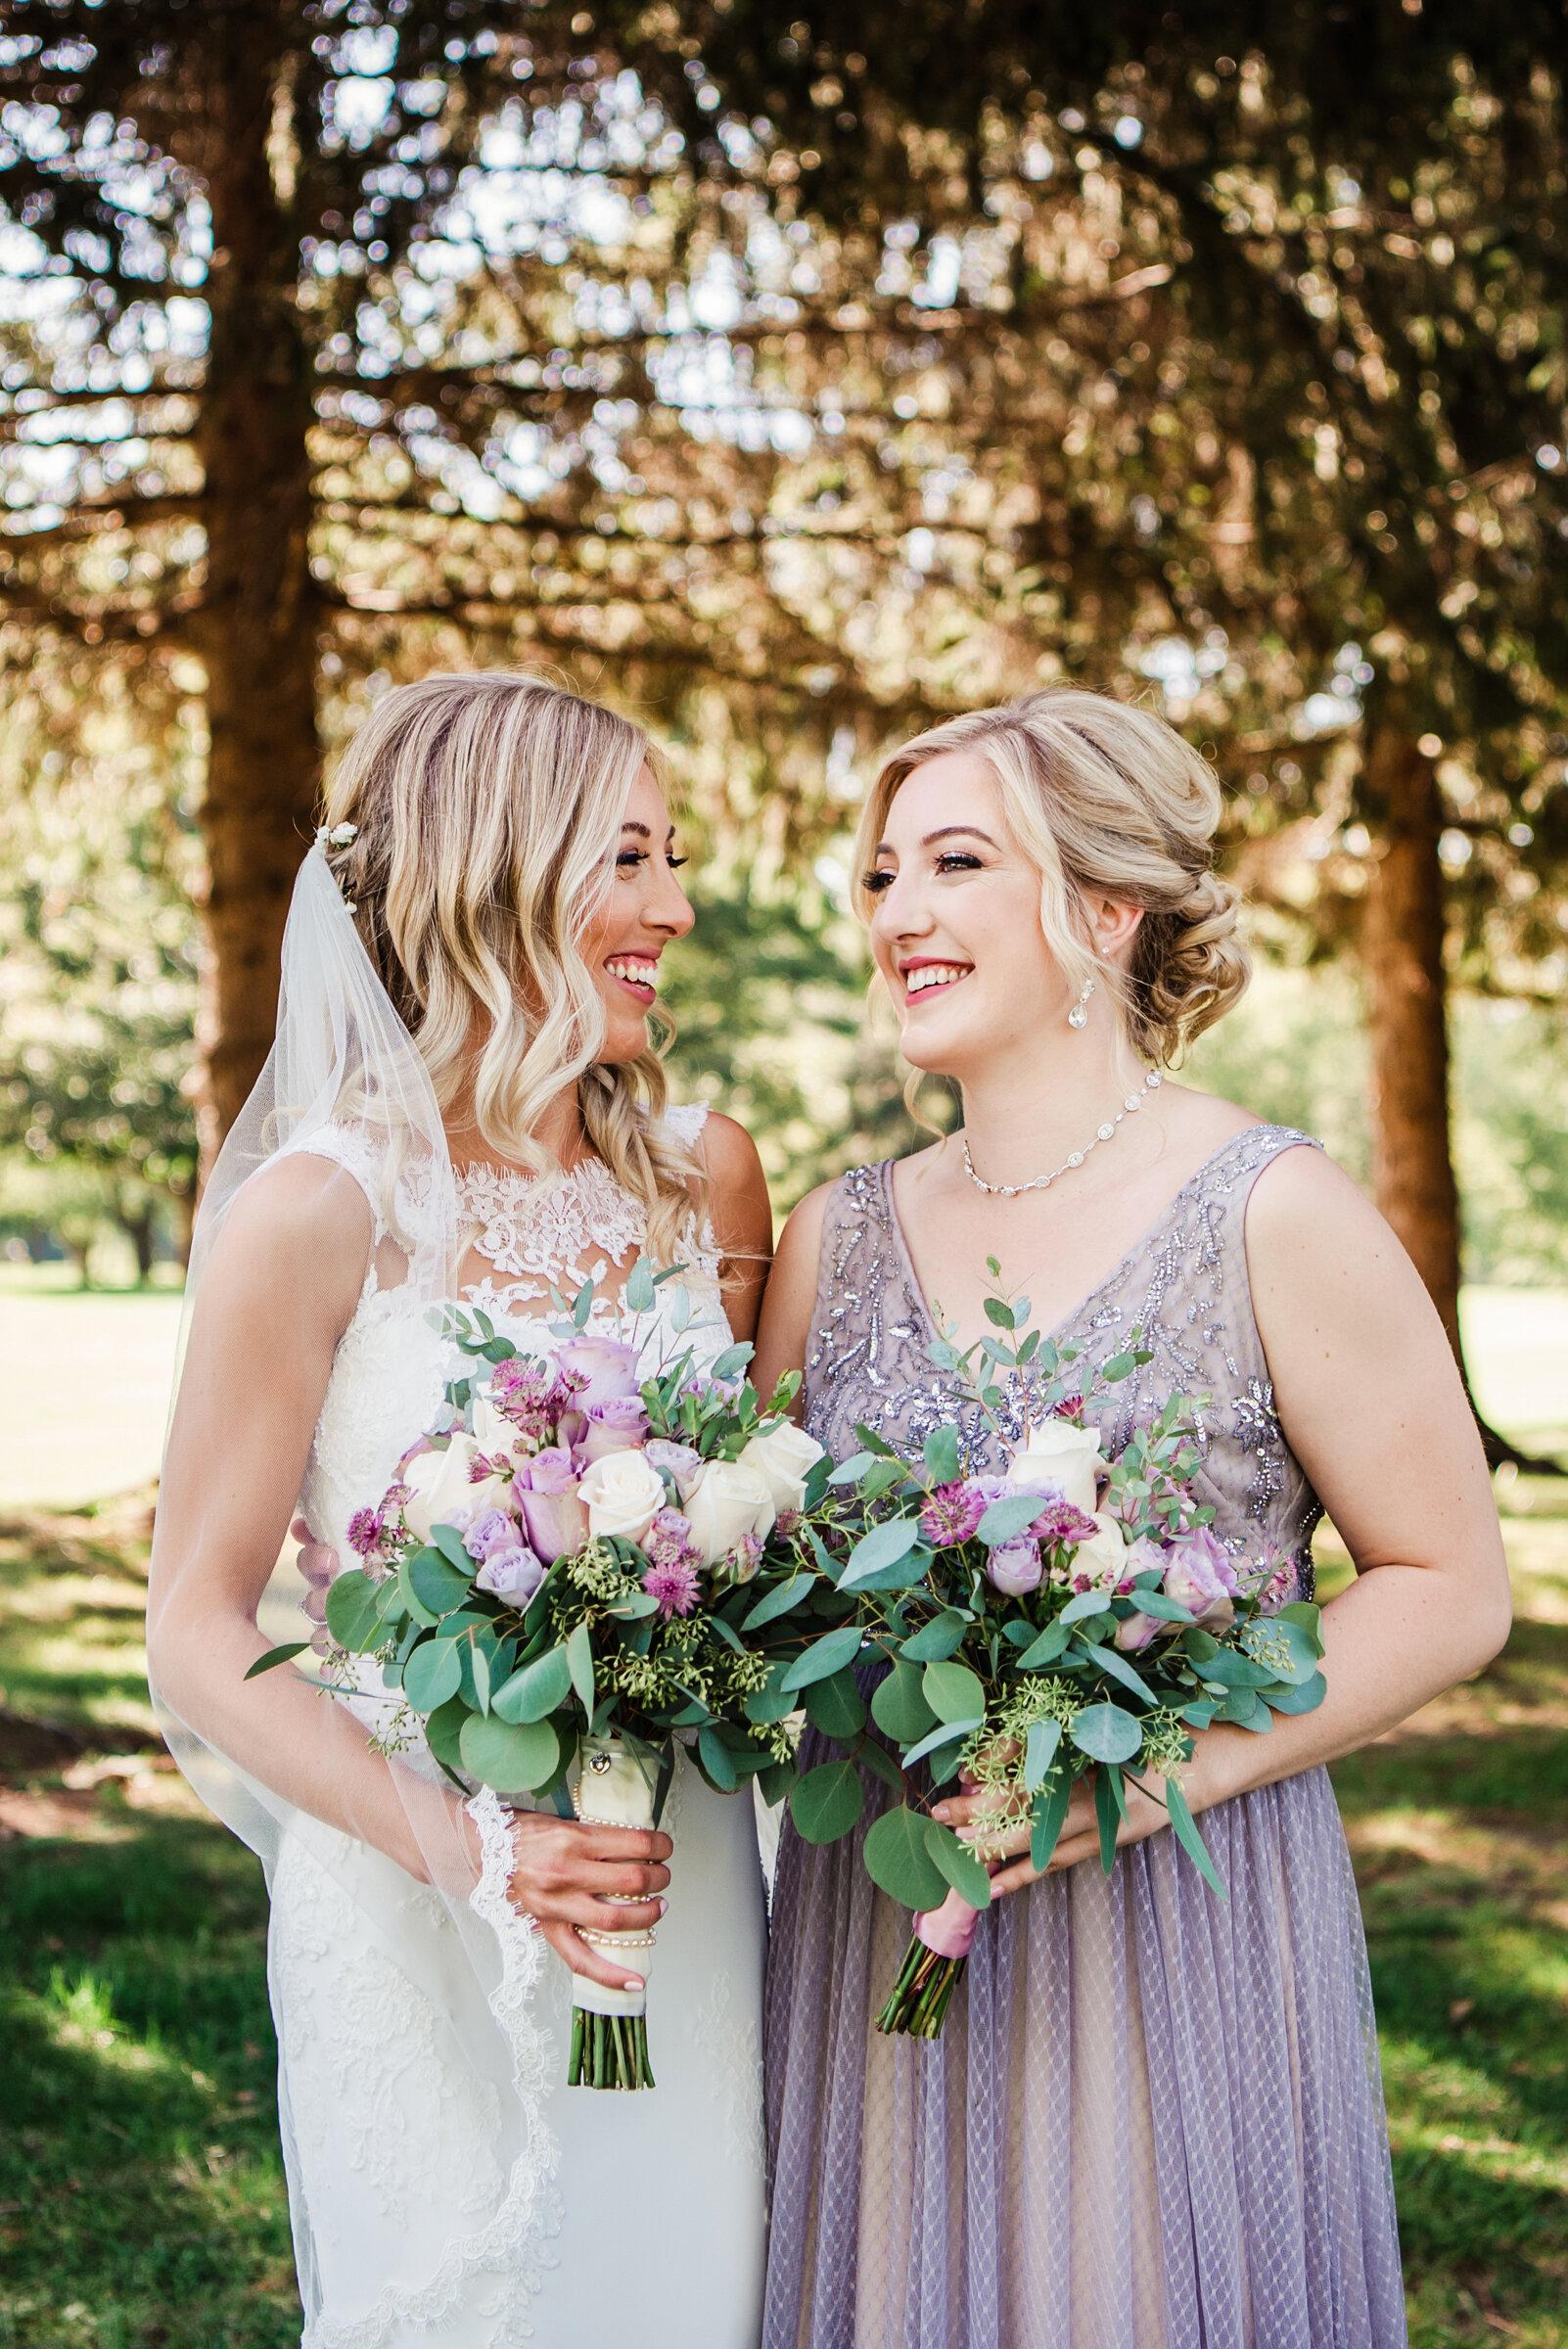 Deerfield_Country_Club_Rochester_Wedding_JILL_STUDIO_Rochester_NY_Photographer_DSC_6088.jpg